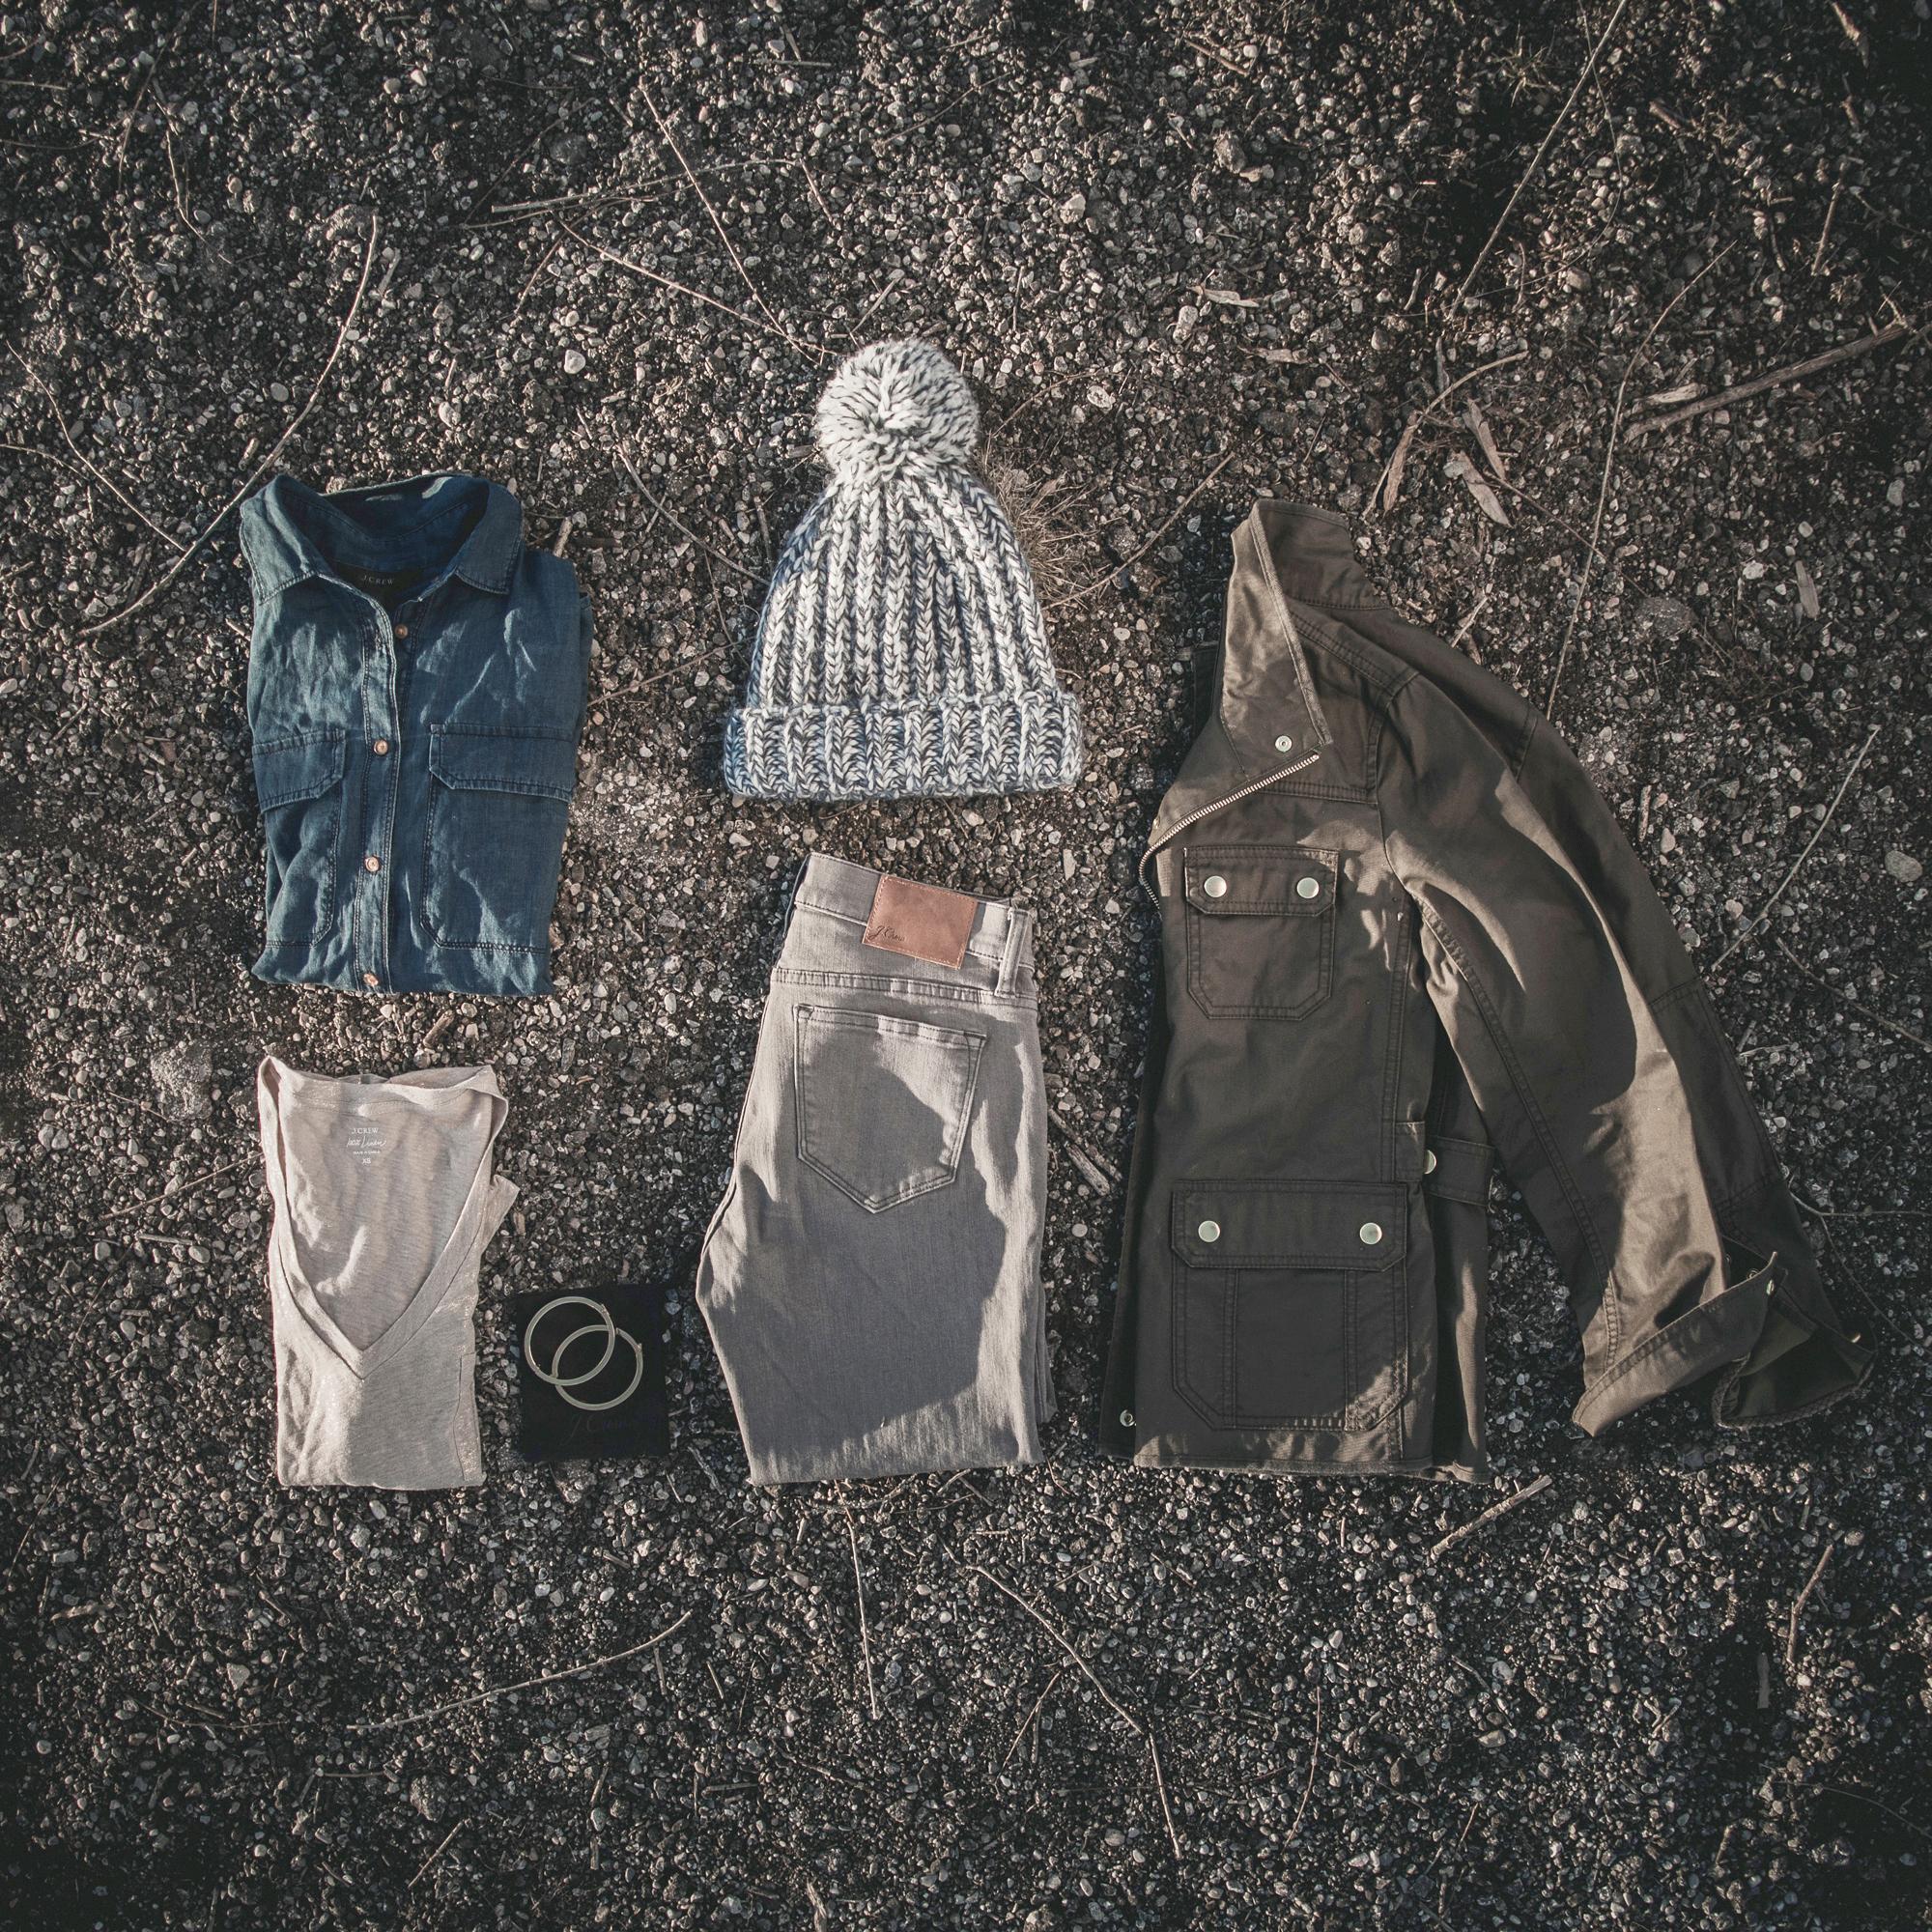 duston-todd-jcrew-fashion-flat-lay.jpg